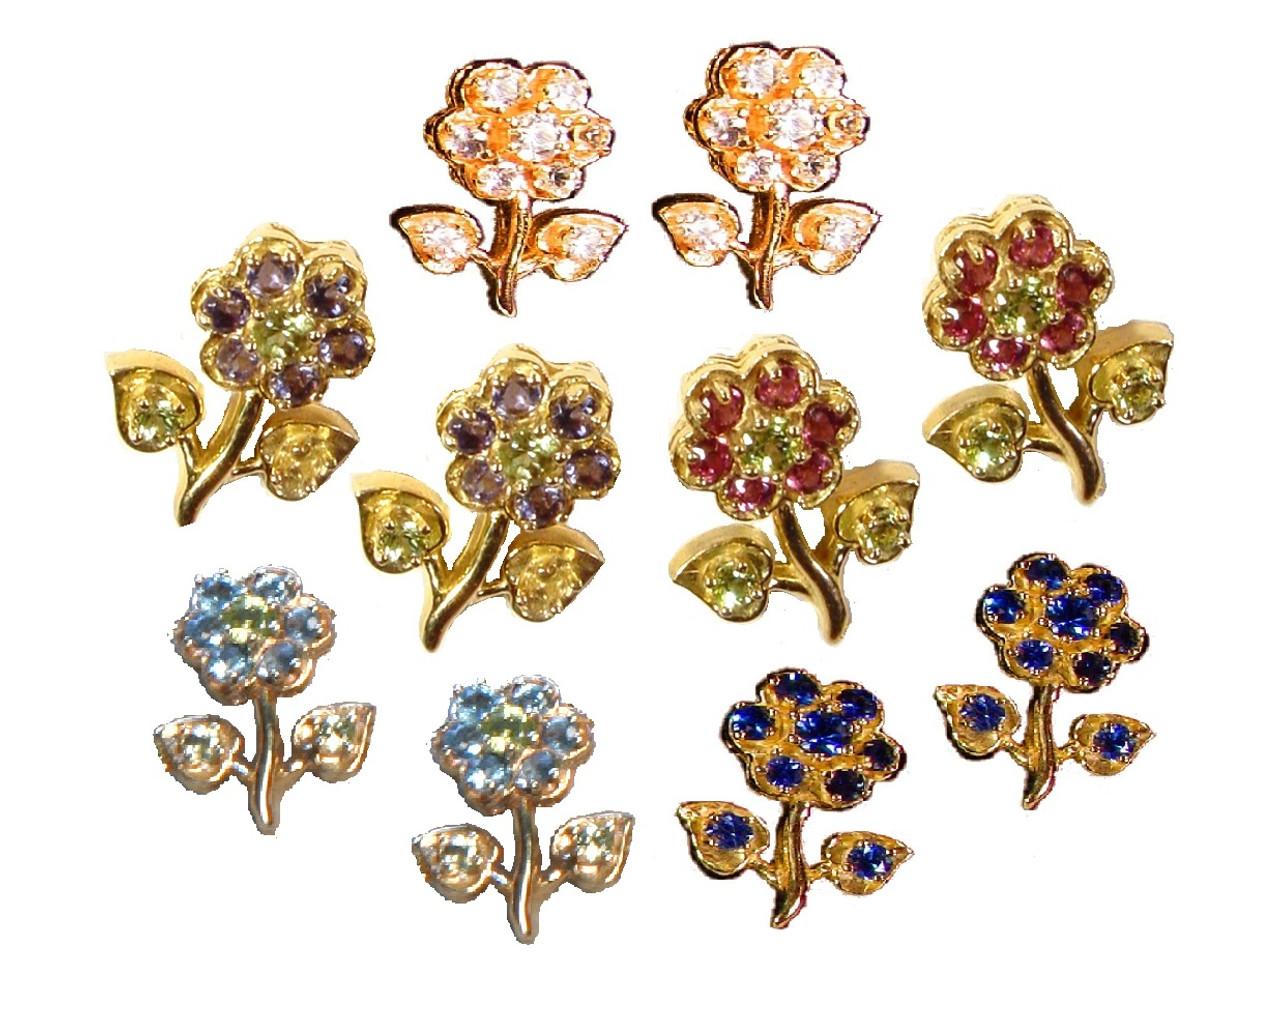 Stem Flower Earrings-18K and semi precious stones